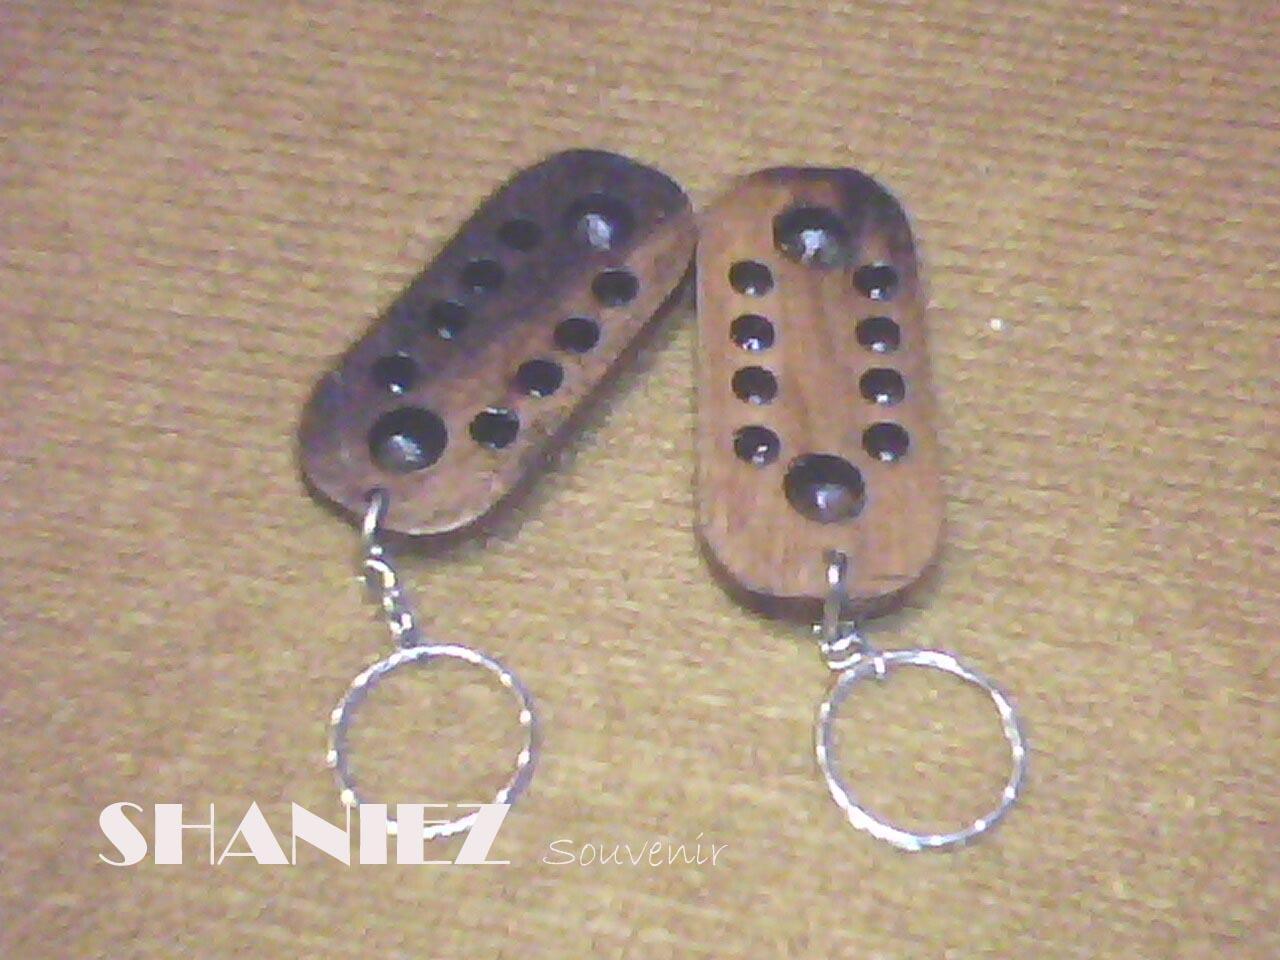 Shaniez Jogja Souvenir Handicraft Gantungan Kunci Sovenir Ganci Dakon Kayu